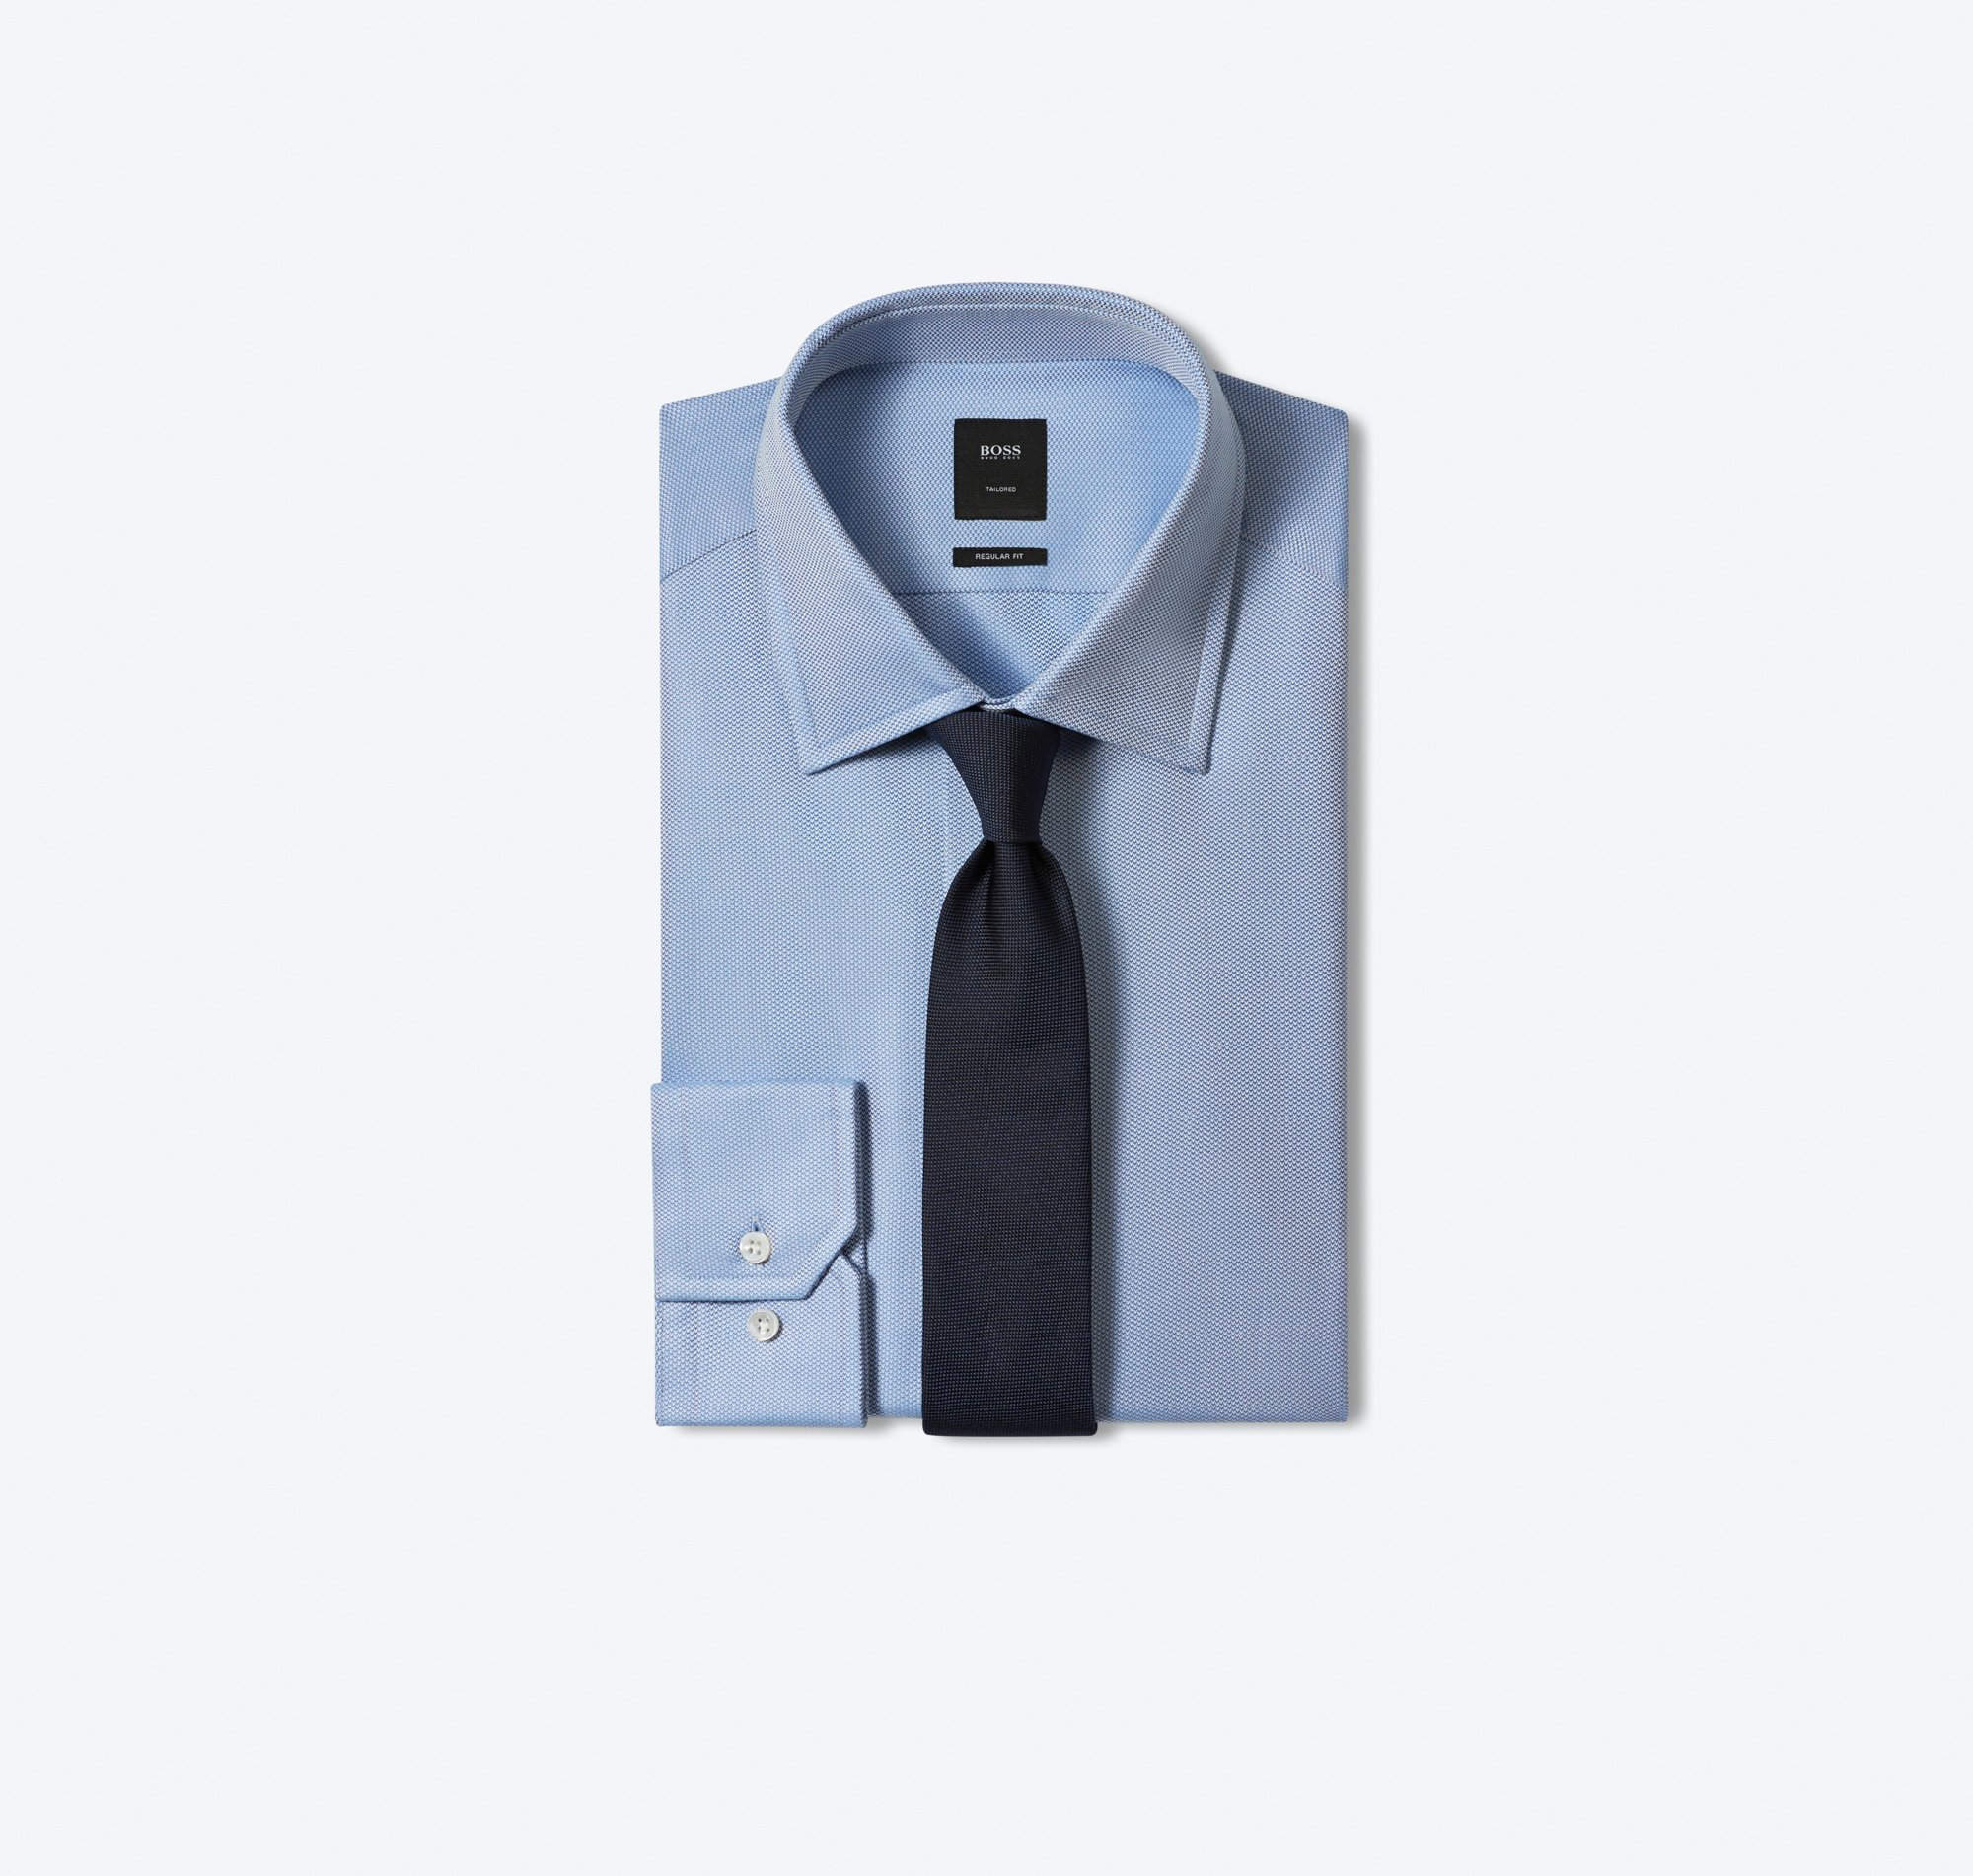 Overhemd van BOSS Menswear